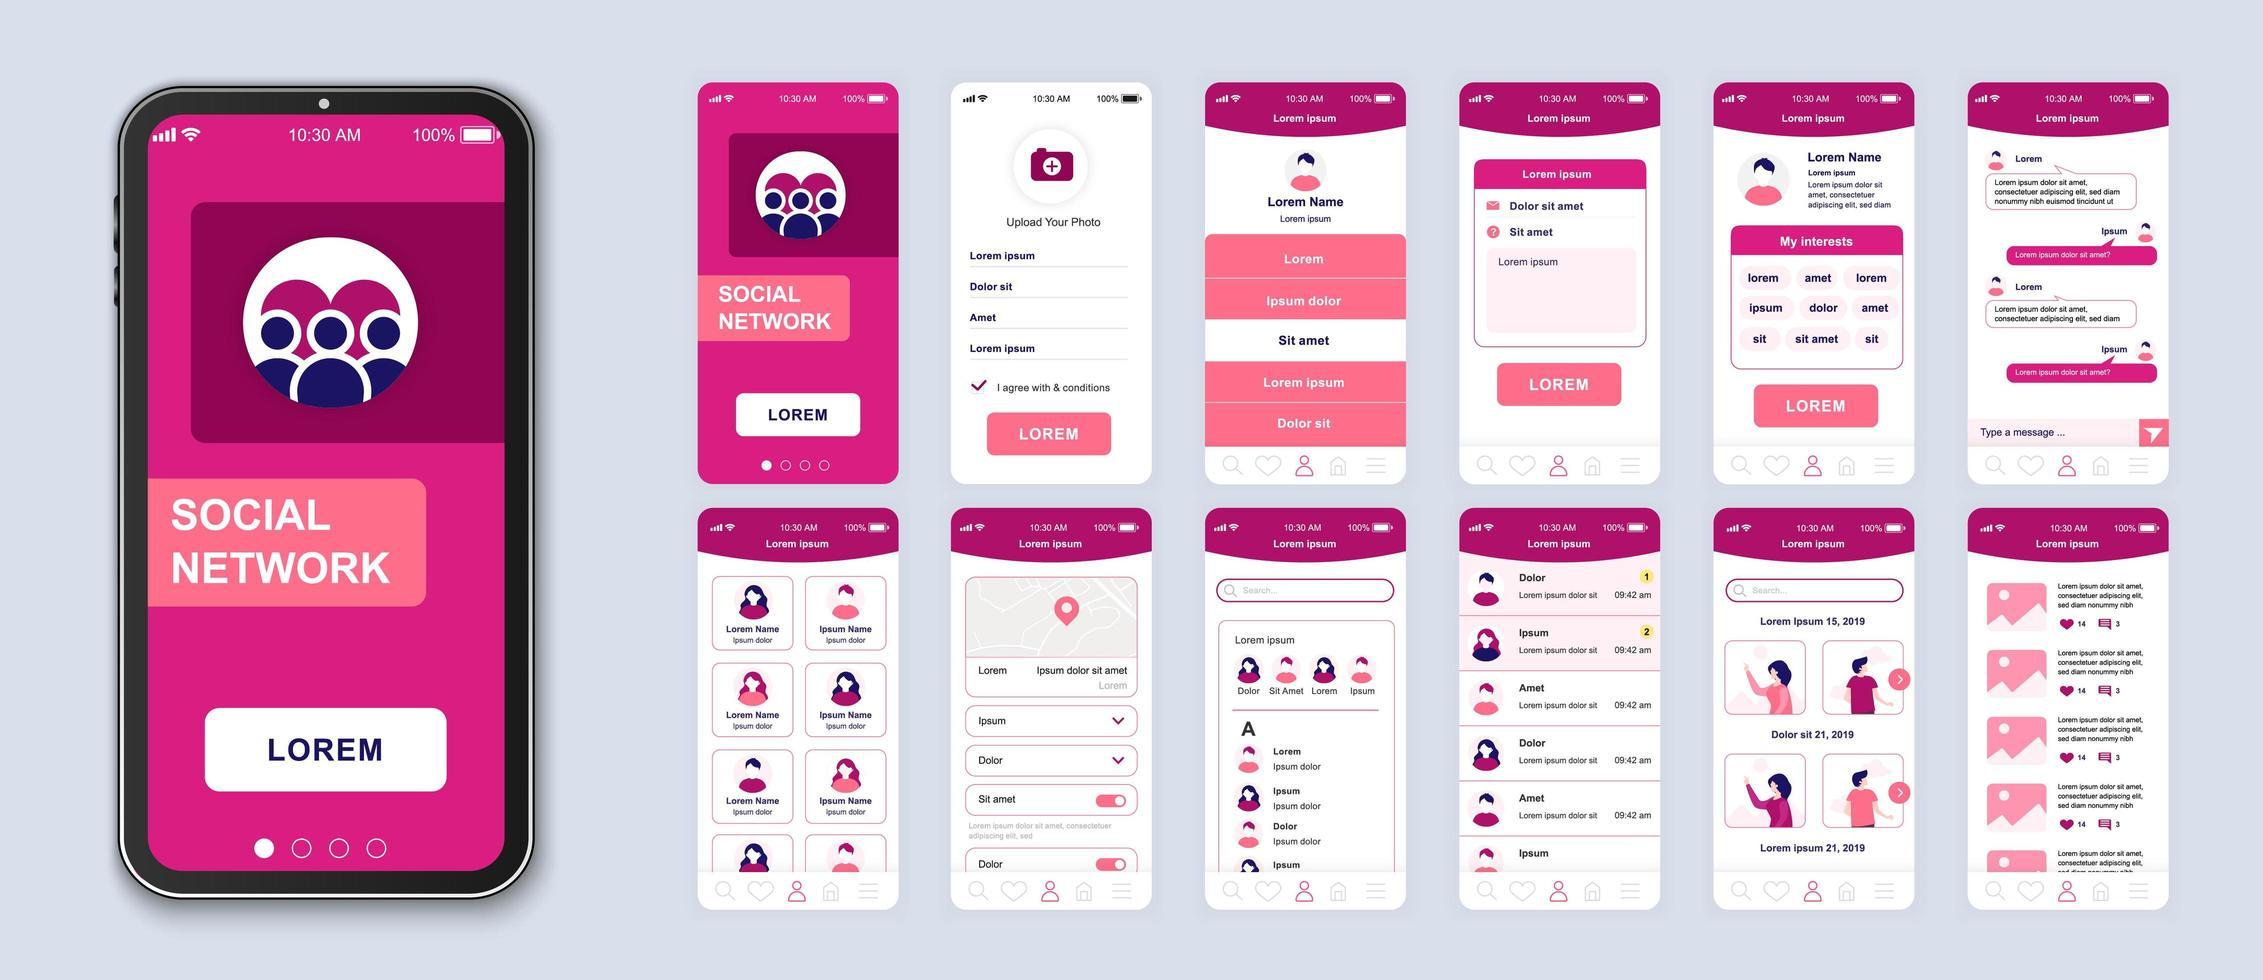 rosa soziale Netzwerk UI Smartphone-Schnittstelle vektor